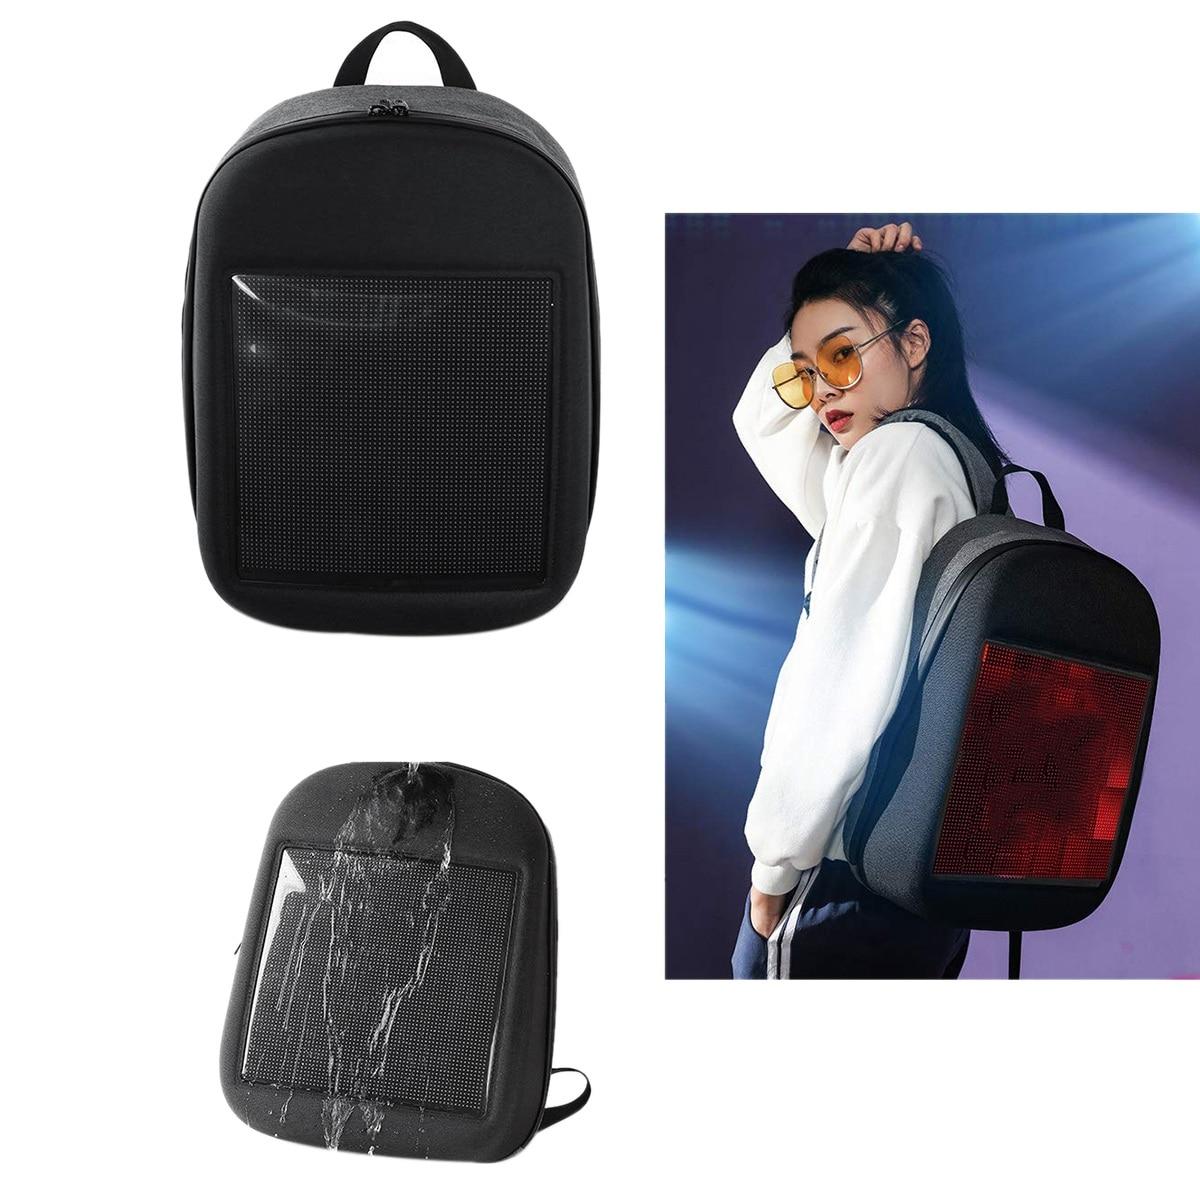 Novo inteligente led mochila legal preto customizável